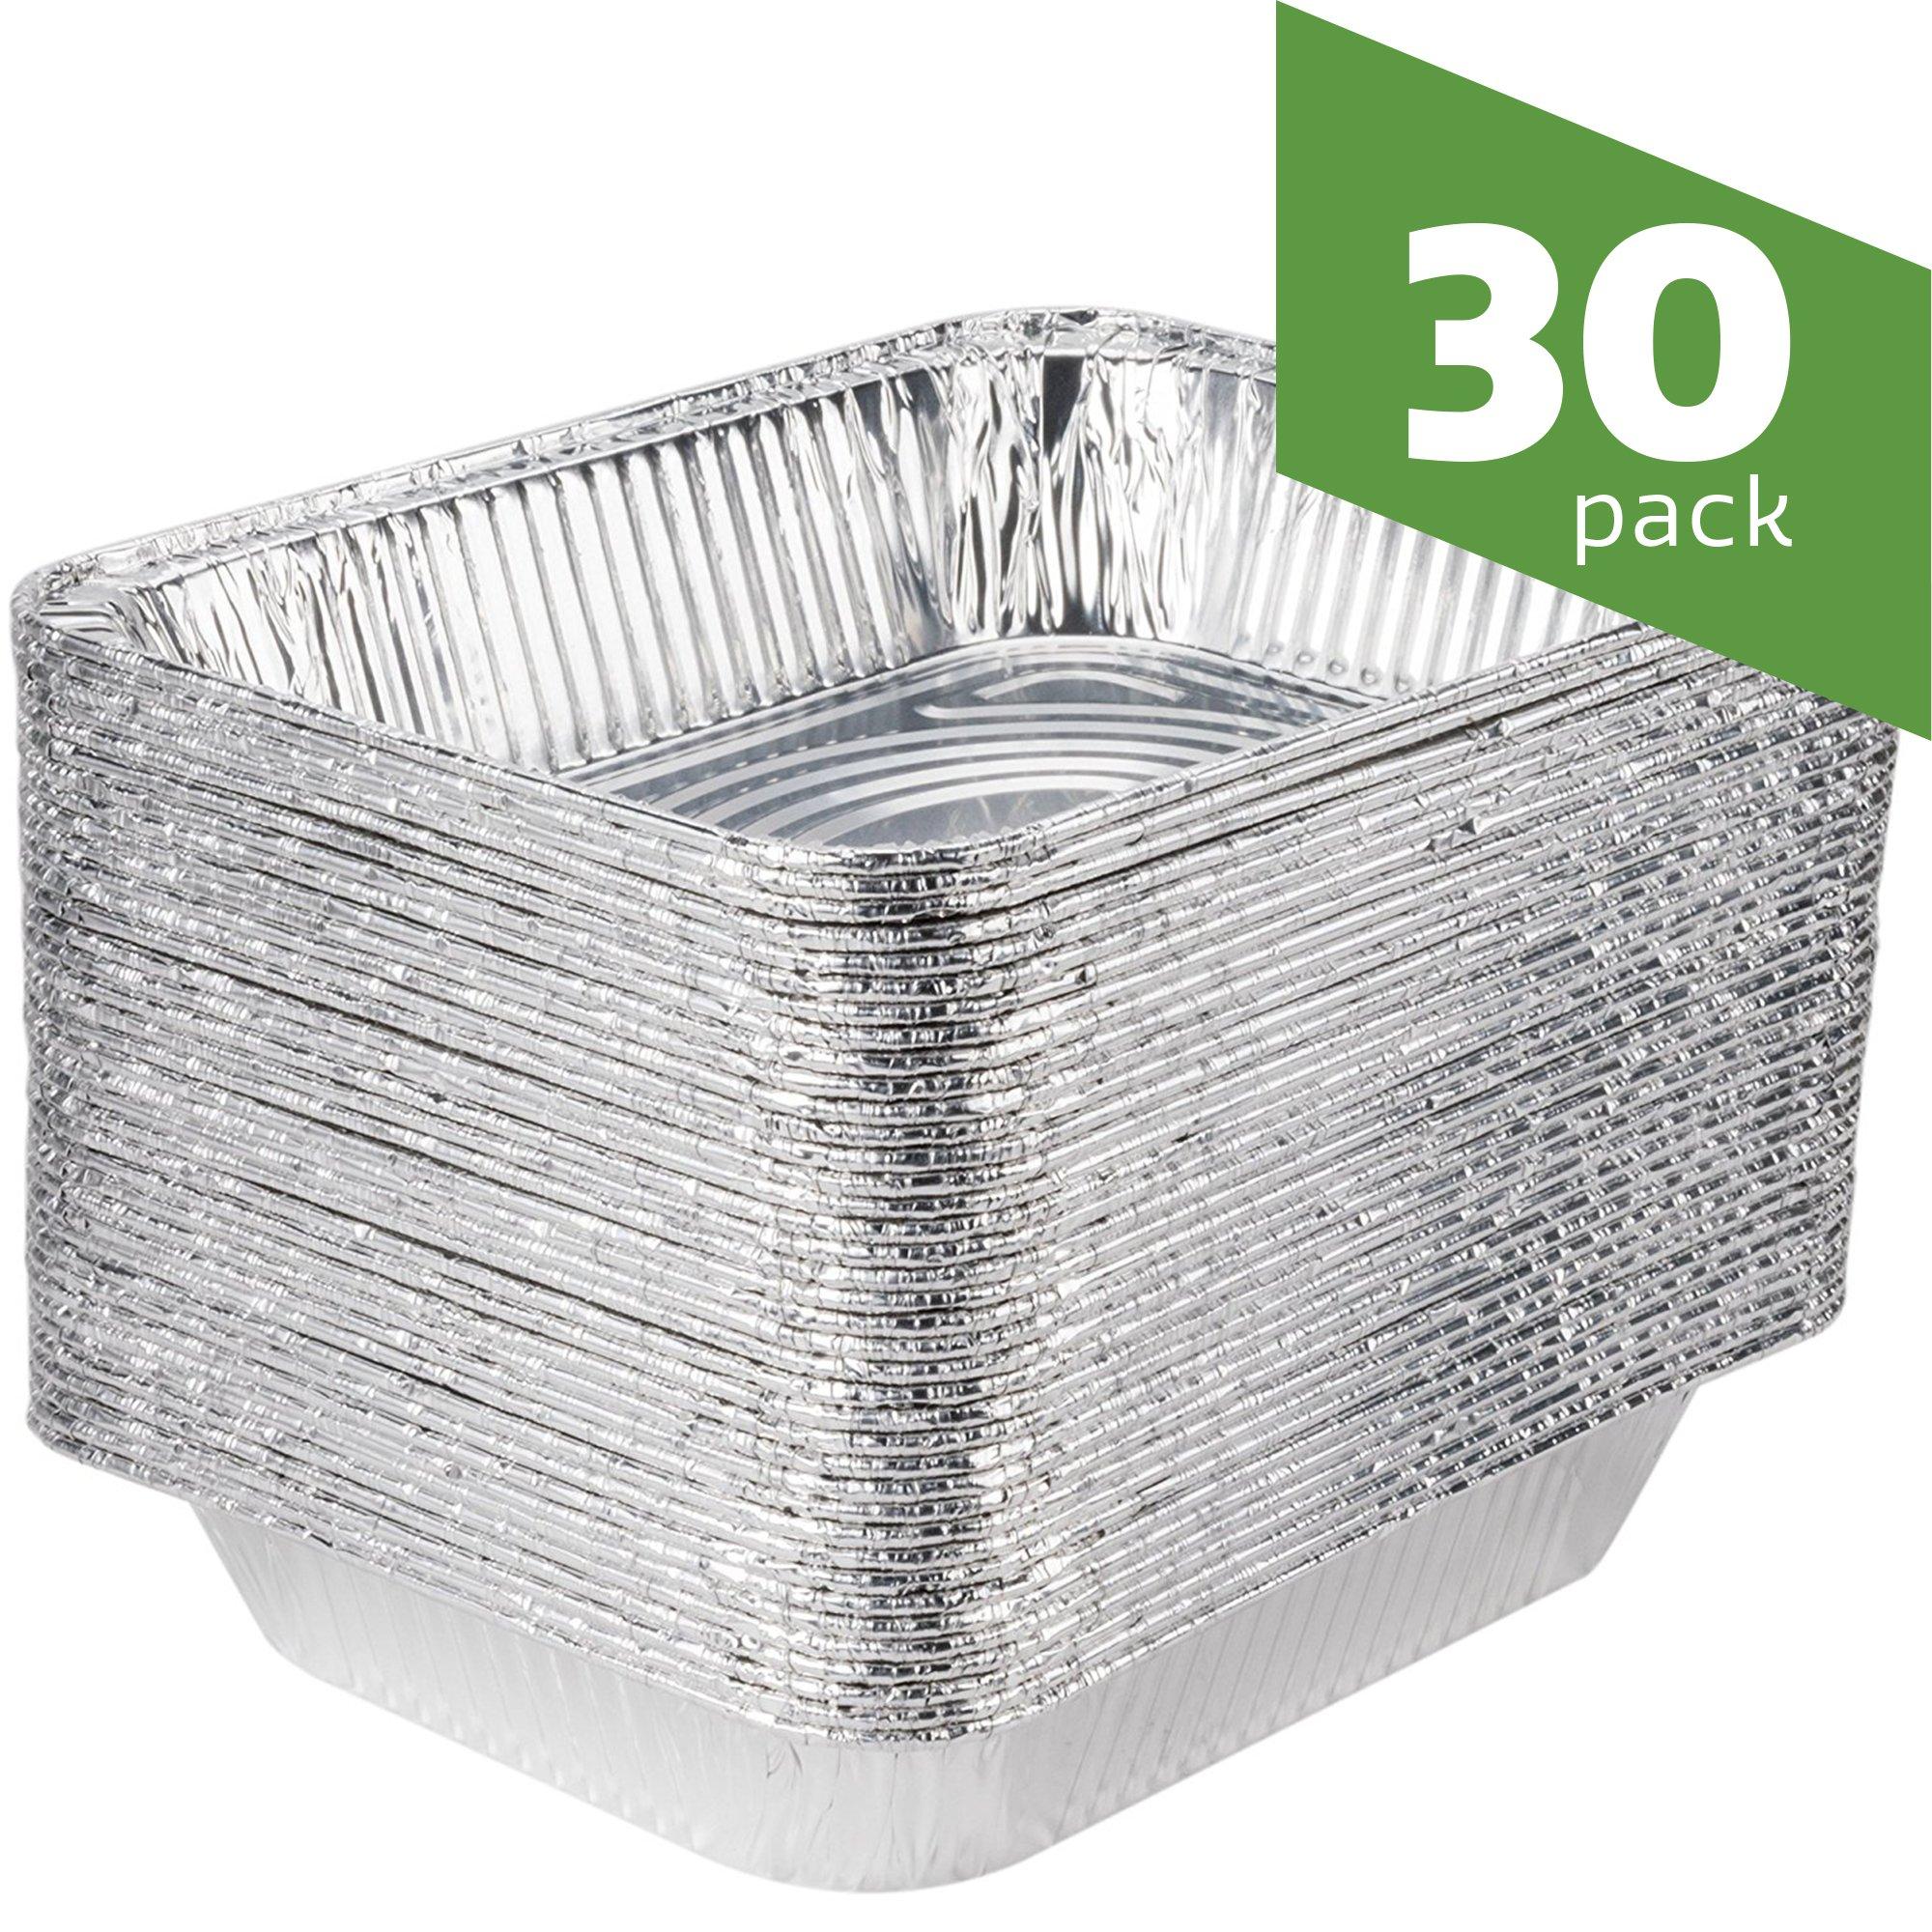 9 x 13 Aluminum Foil Pans [30 Pack] Half Size Deep Steam Table Pans by Comfy Package